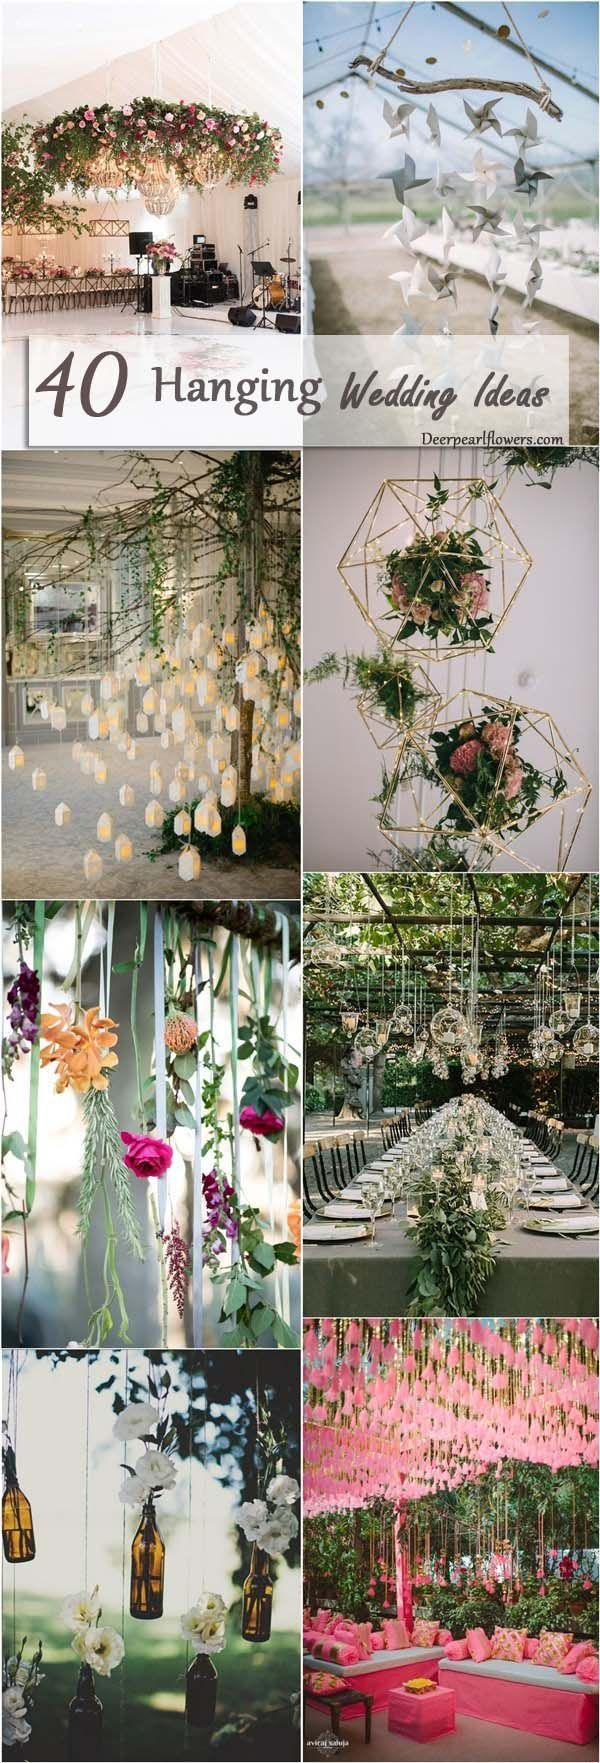 hanging wedding ideas and themes / www.deerpearlflow...